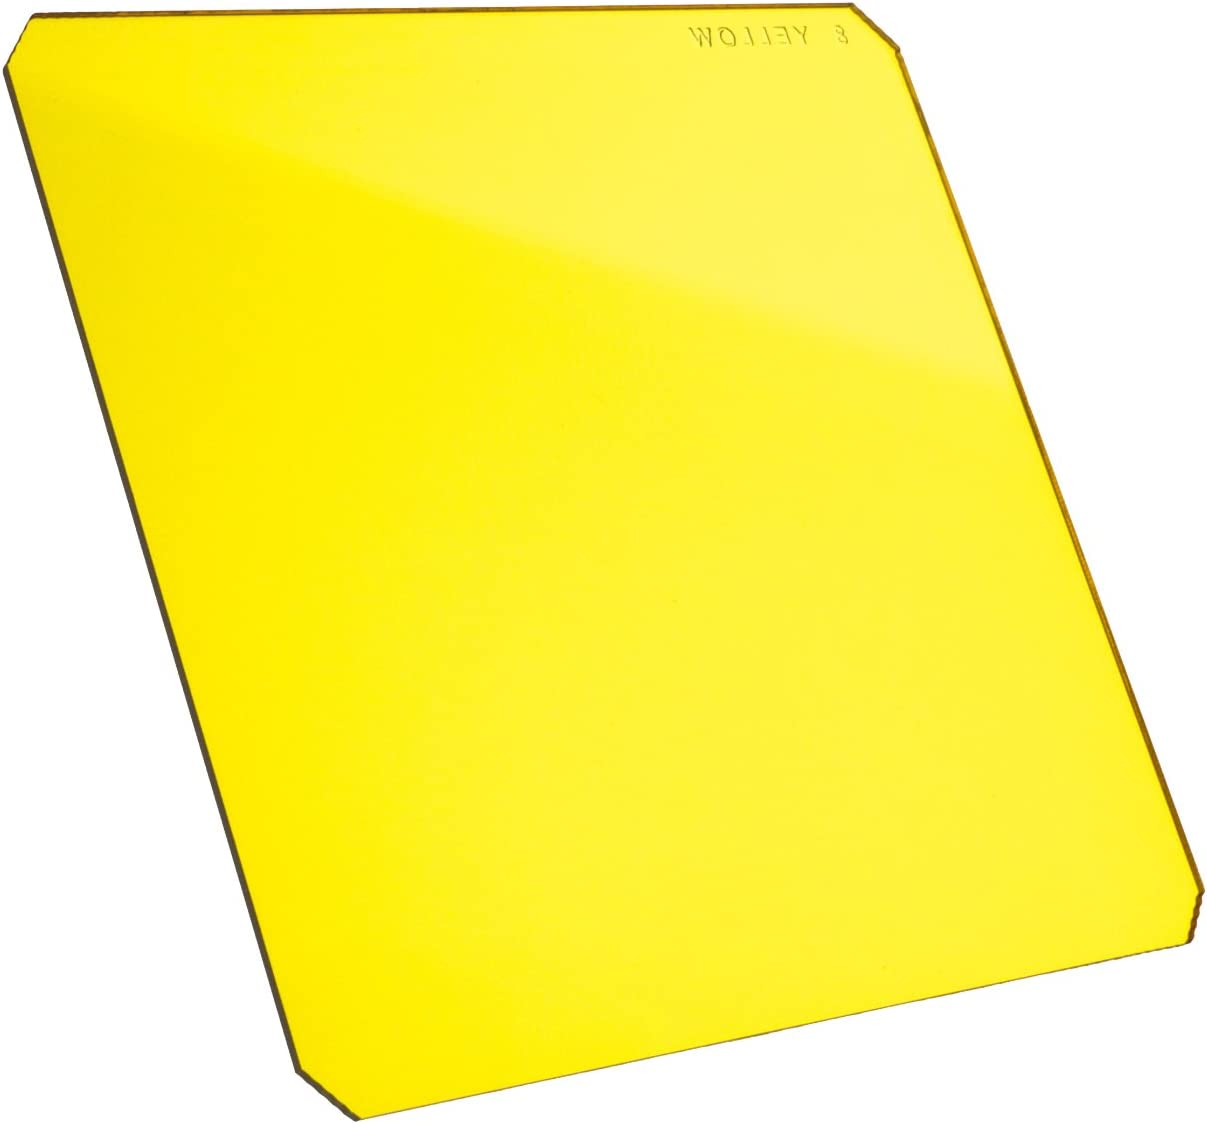 Formatt-Hitech 100x100mm Resin Black and White 8 Yellow 4x4